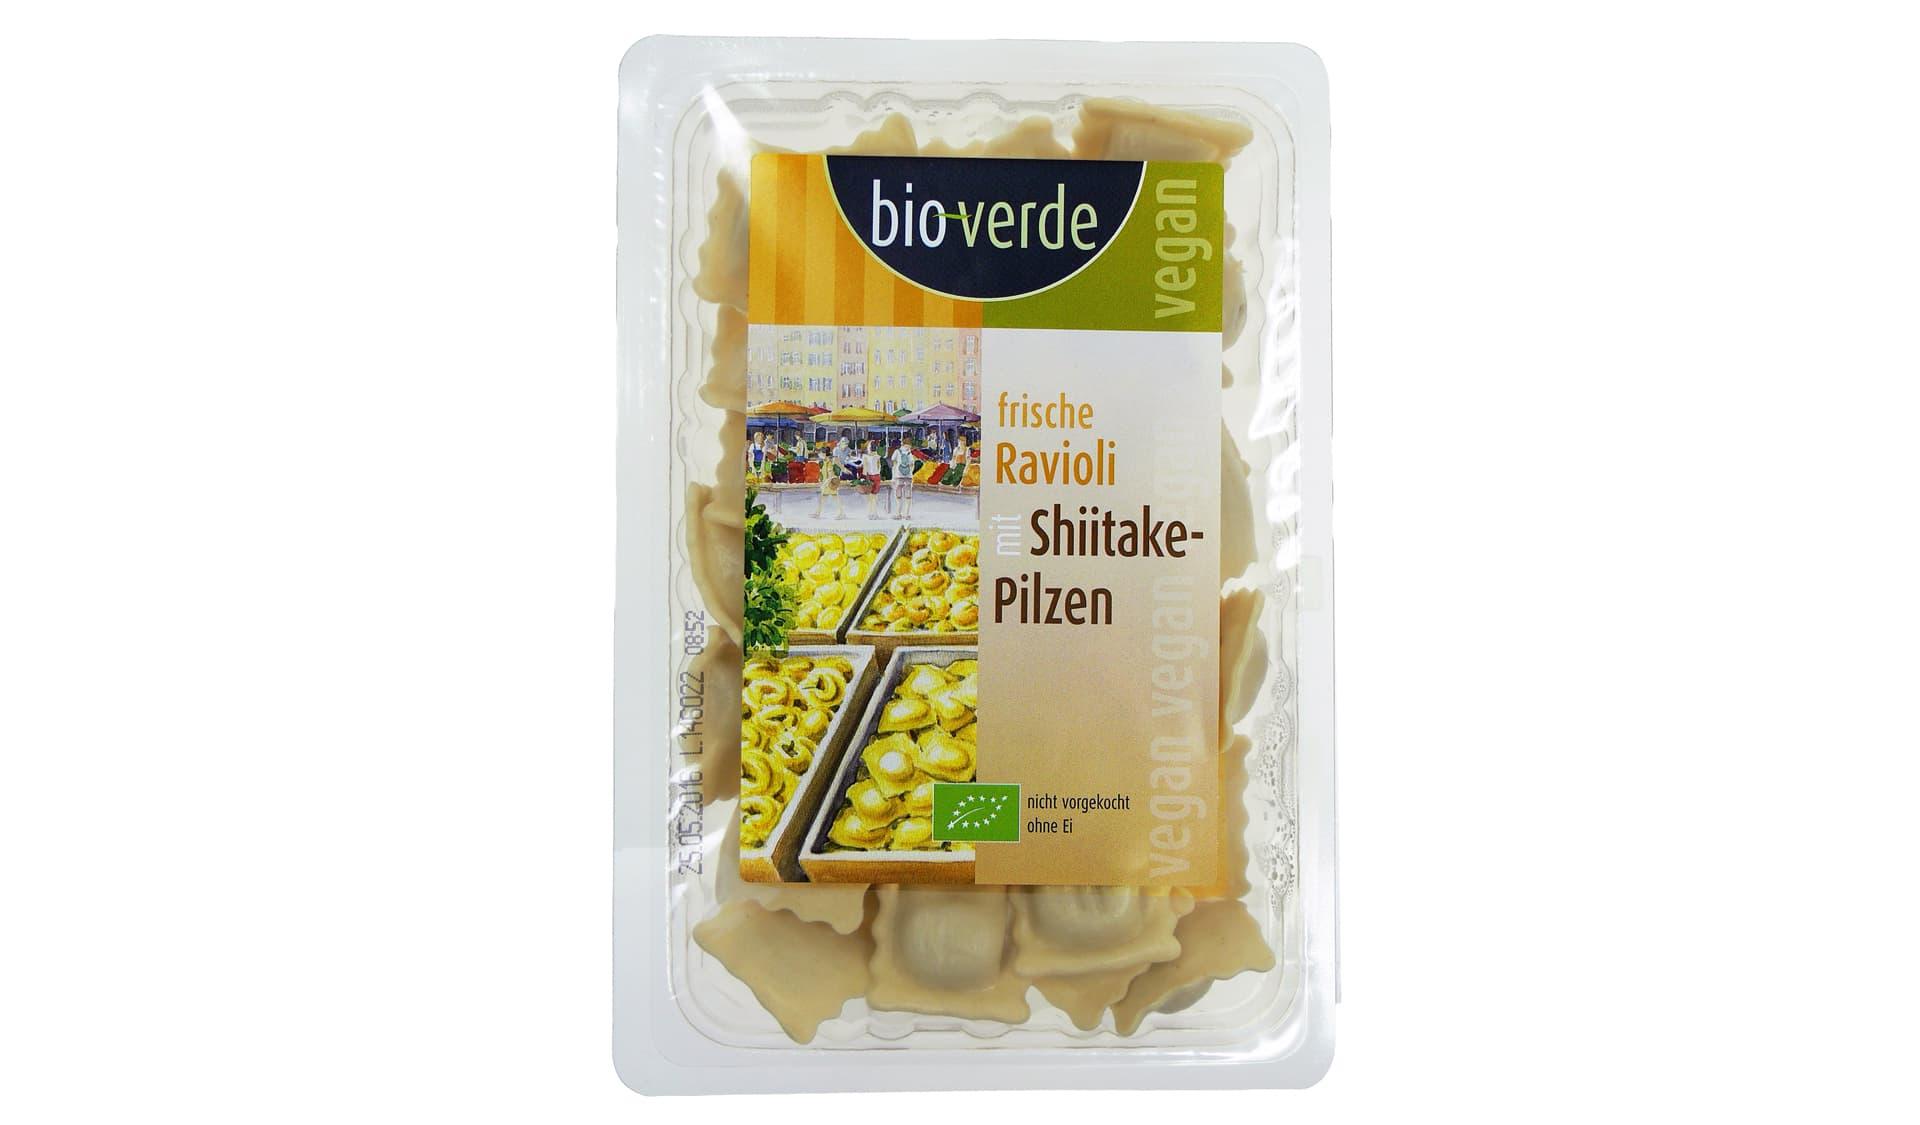 bioverde (www.isana.de) Frische Ravioli mit Shiitake-Pilzen